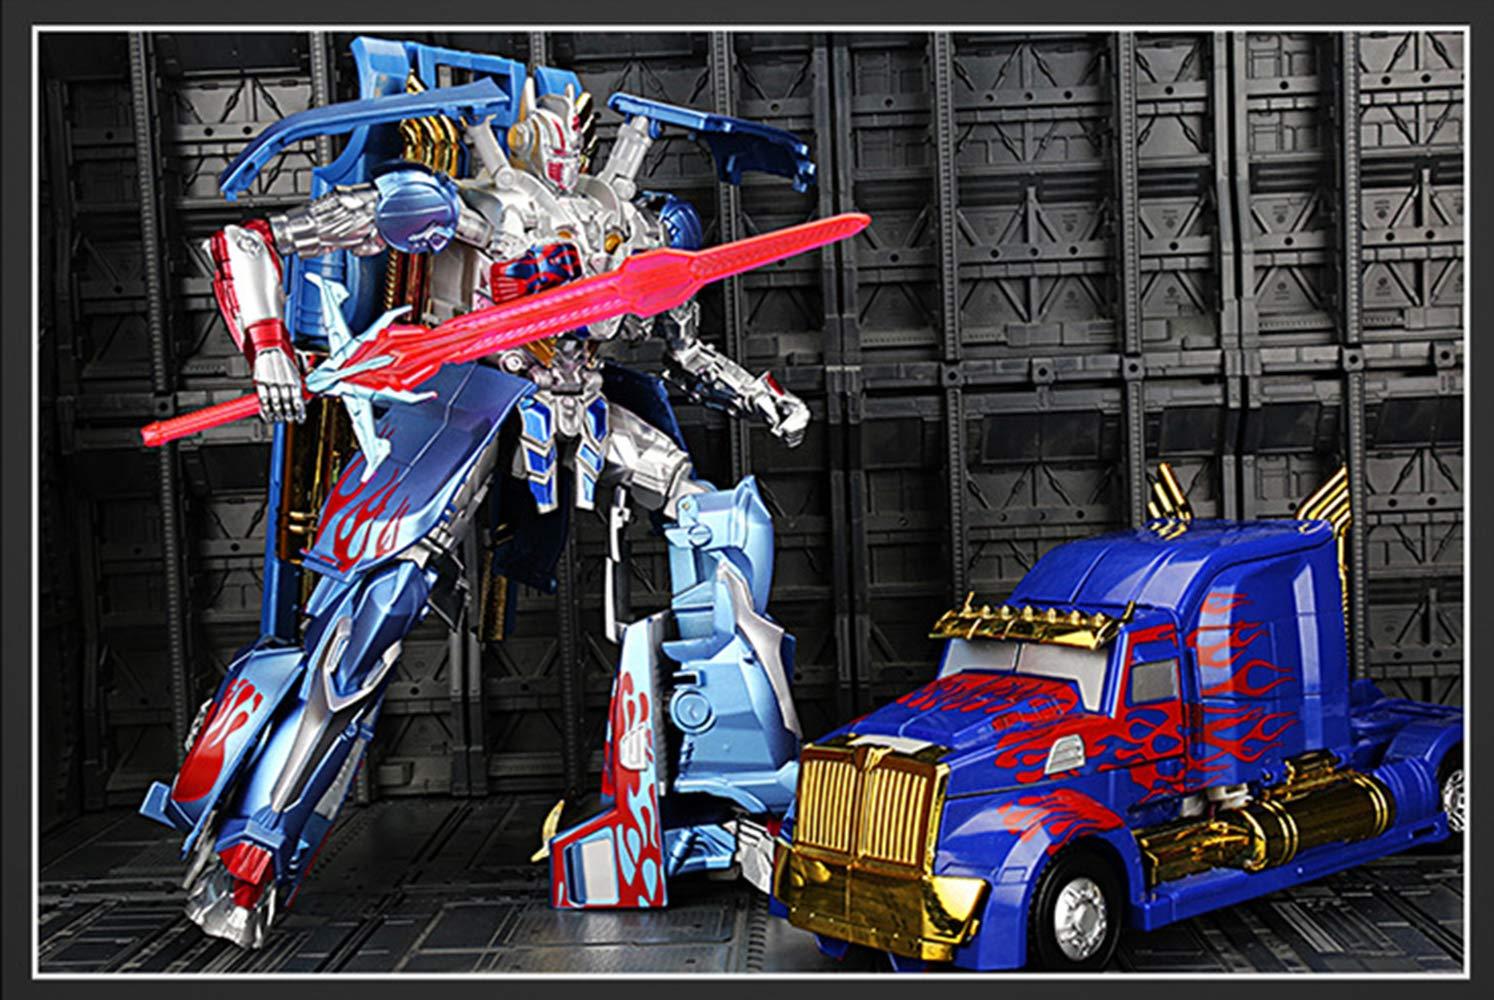 a precios asequibles ZGUO Transformers Boys Juguetes para niños Edición Edición Edición de película Alloy Optimus Prime Coche Robot Police Coche Regalos Azul Azul Optimus  tiendas minoristas